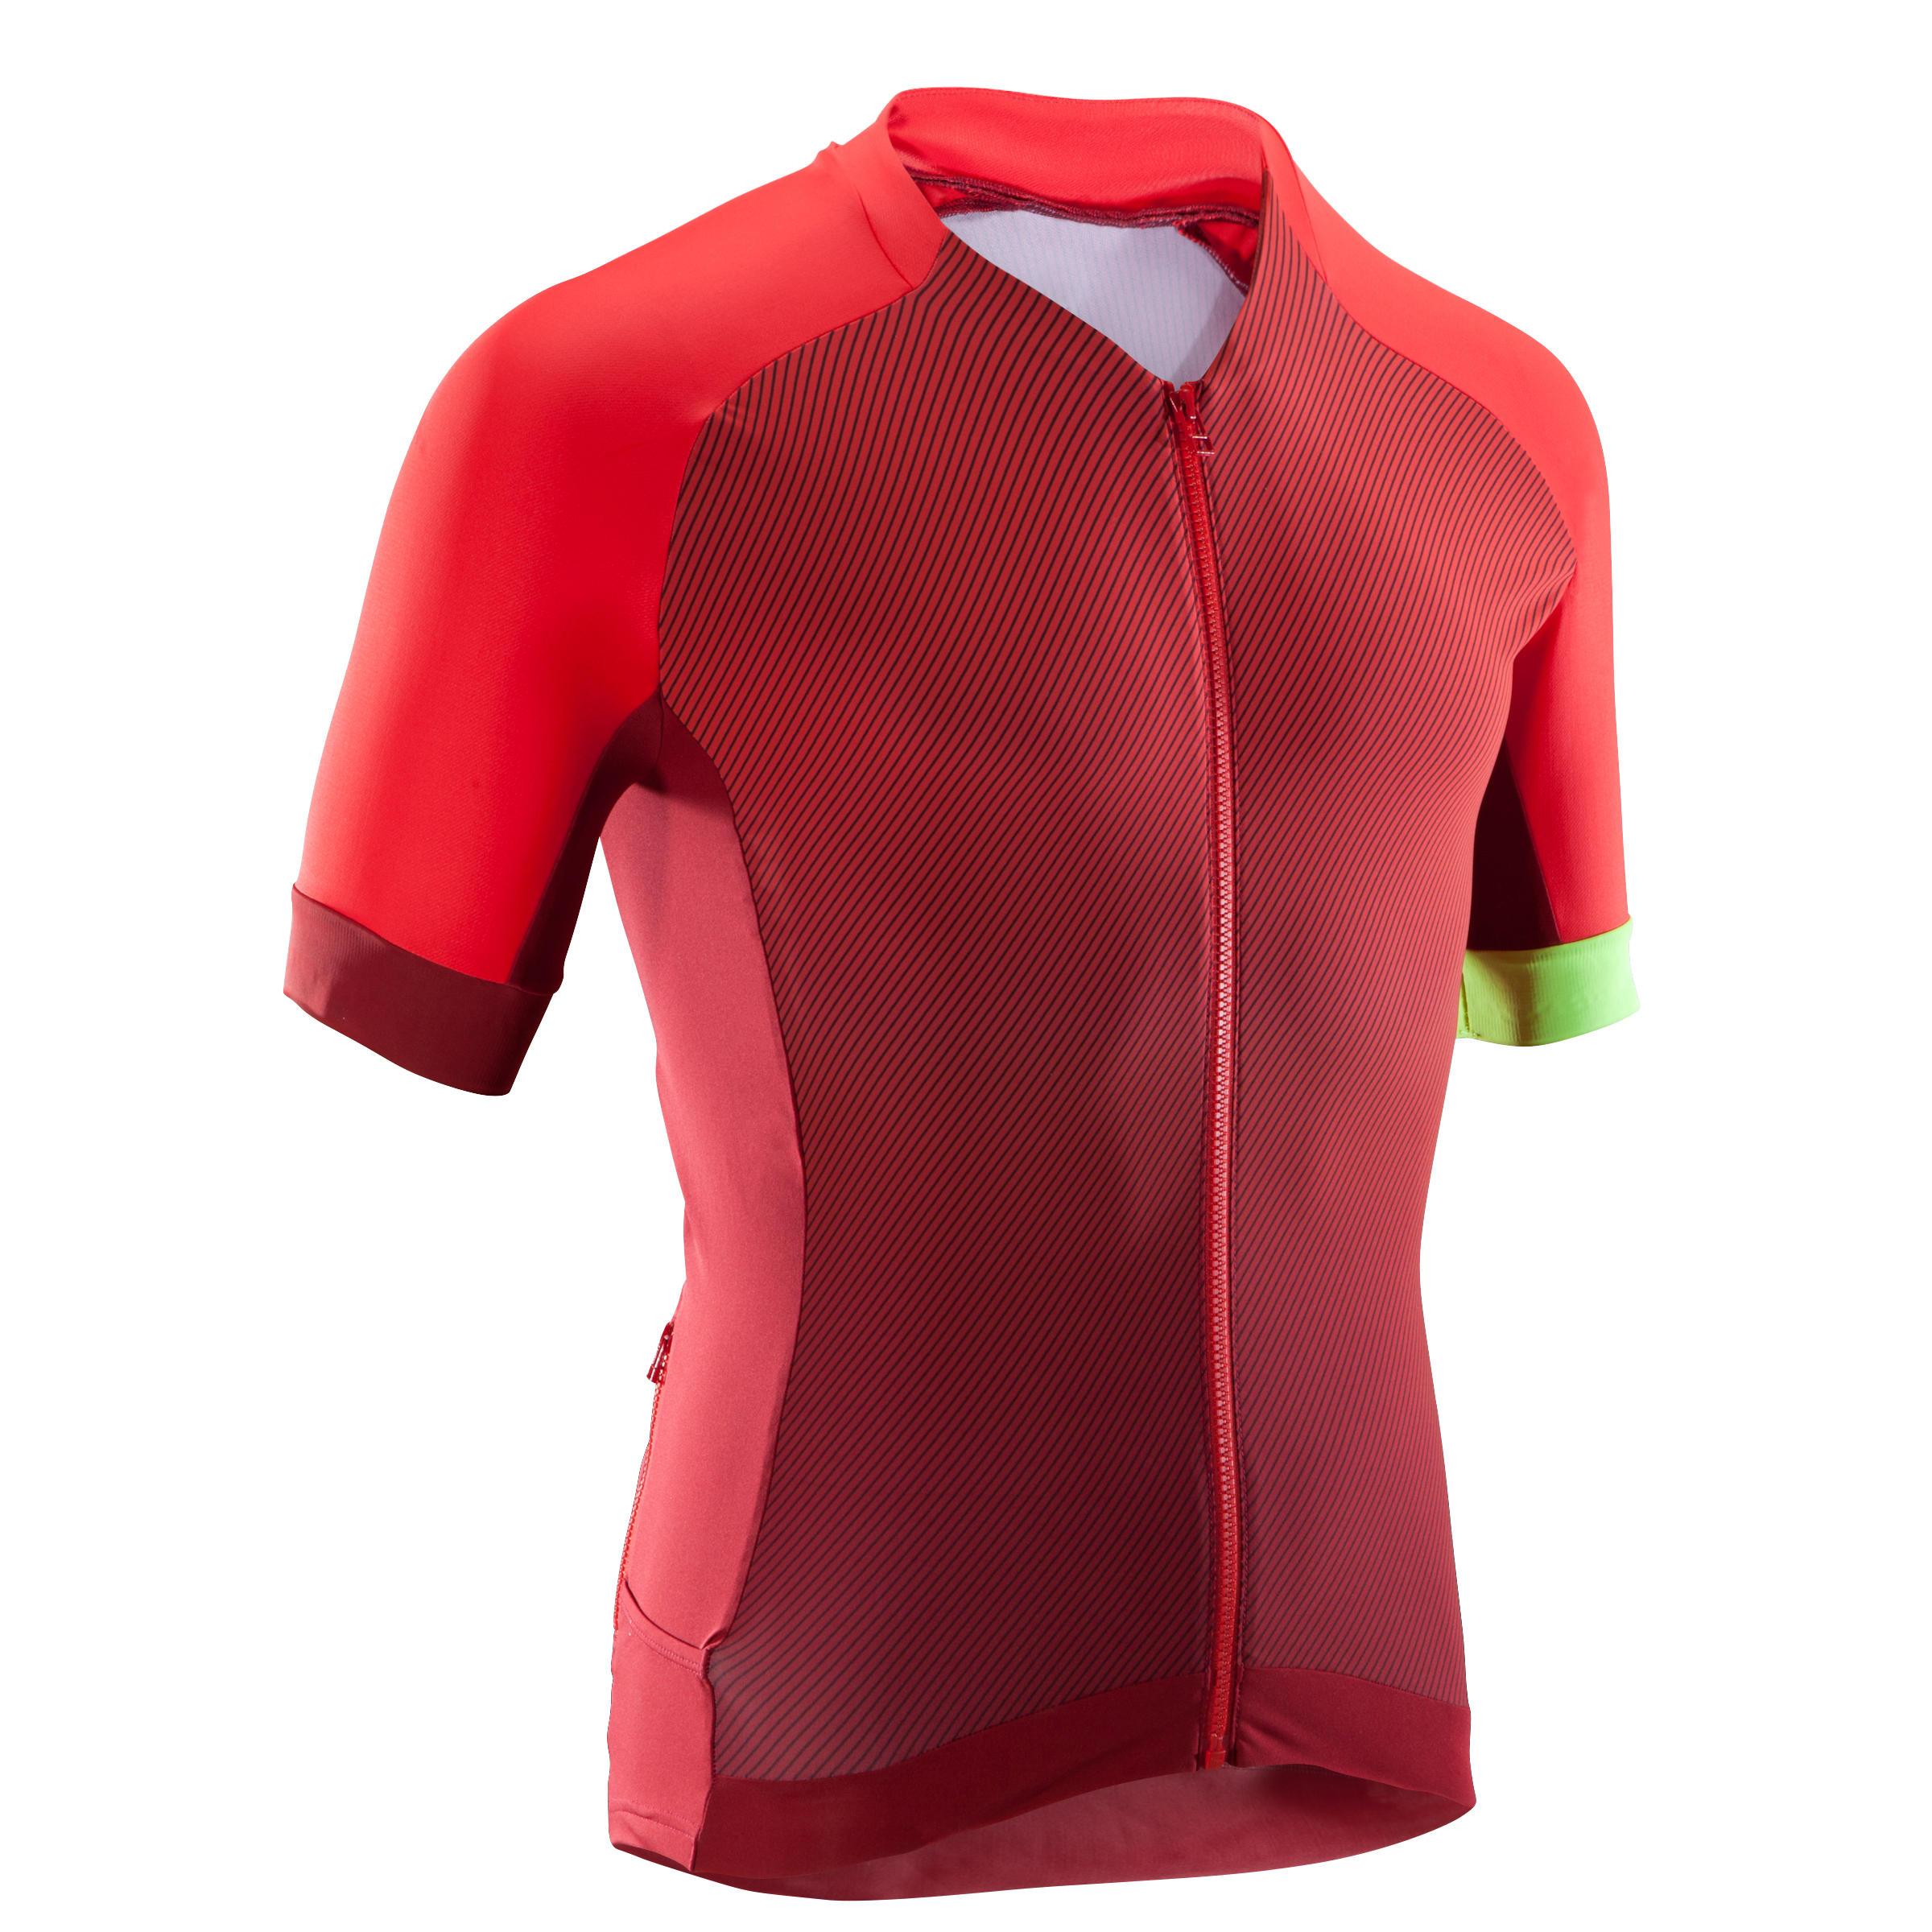 Fahrradtrikot MTB XC Light Herren rot | Sportbekleidung > Trikots > Fahrradtrikots | Rot - Gelb | Rockrider